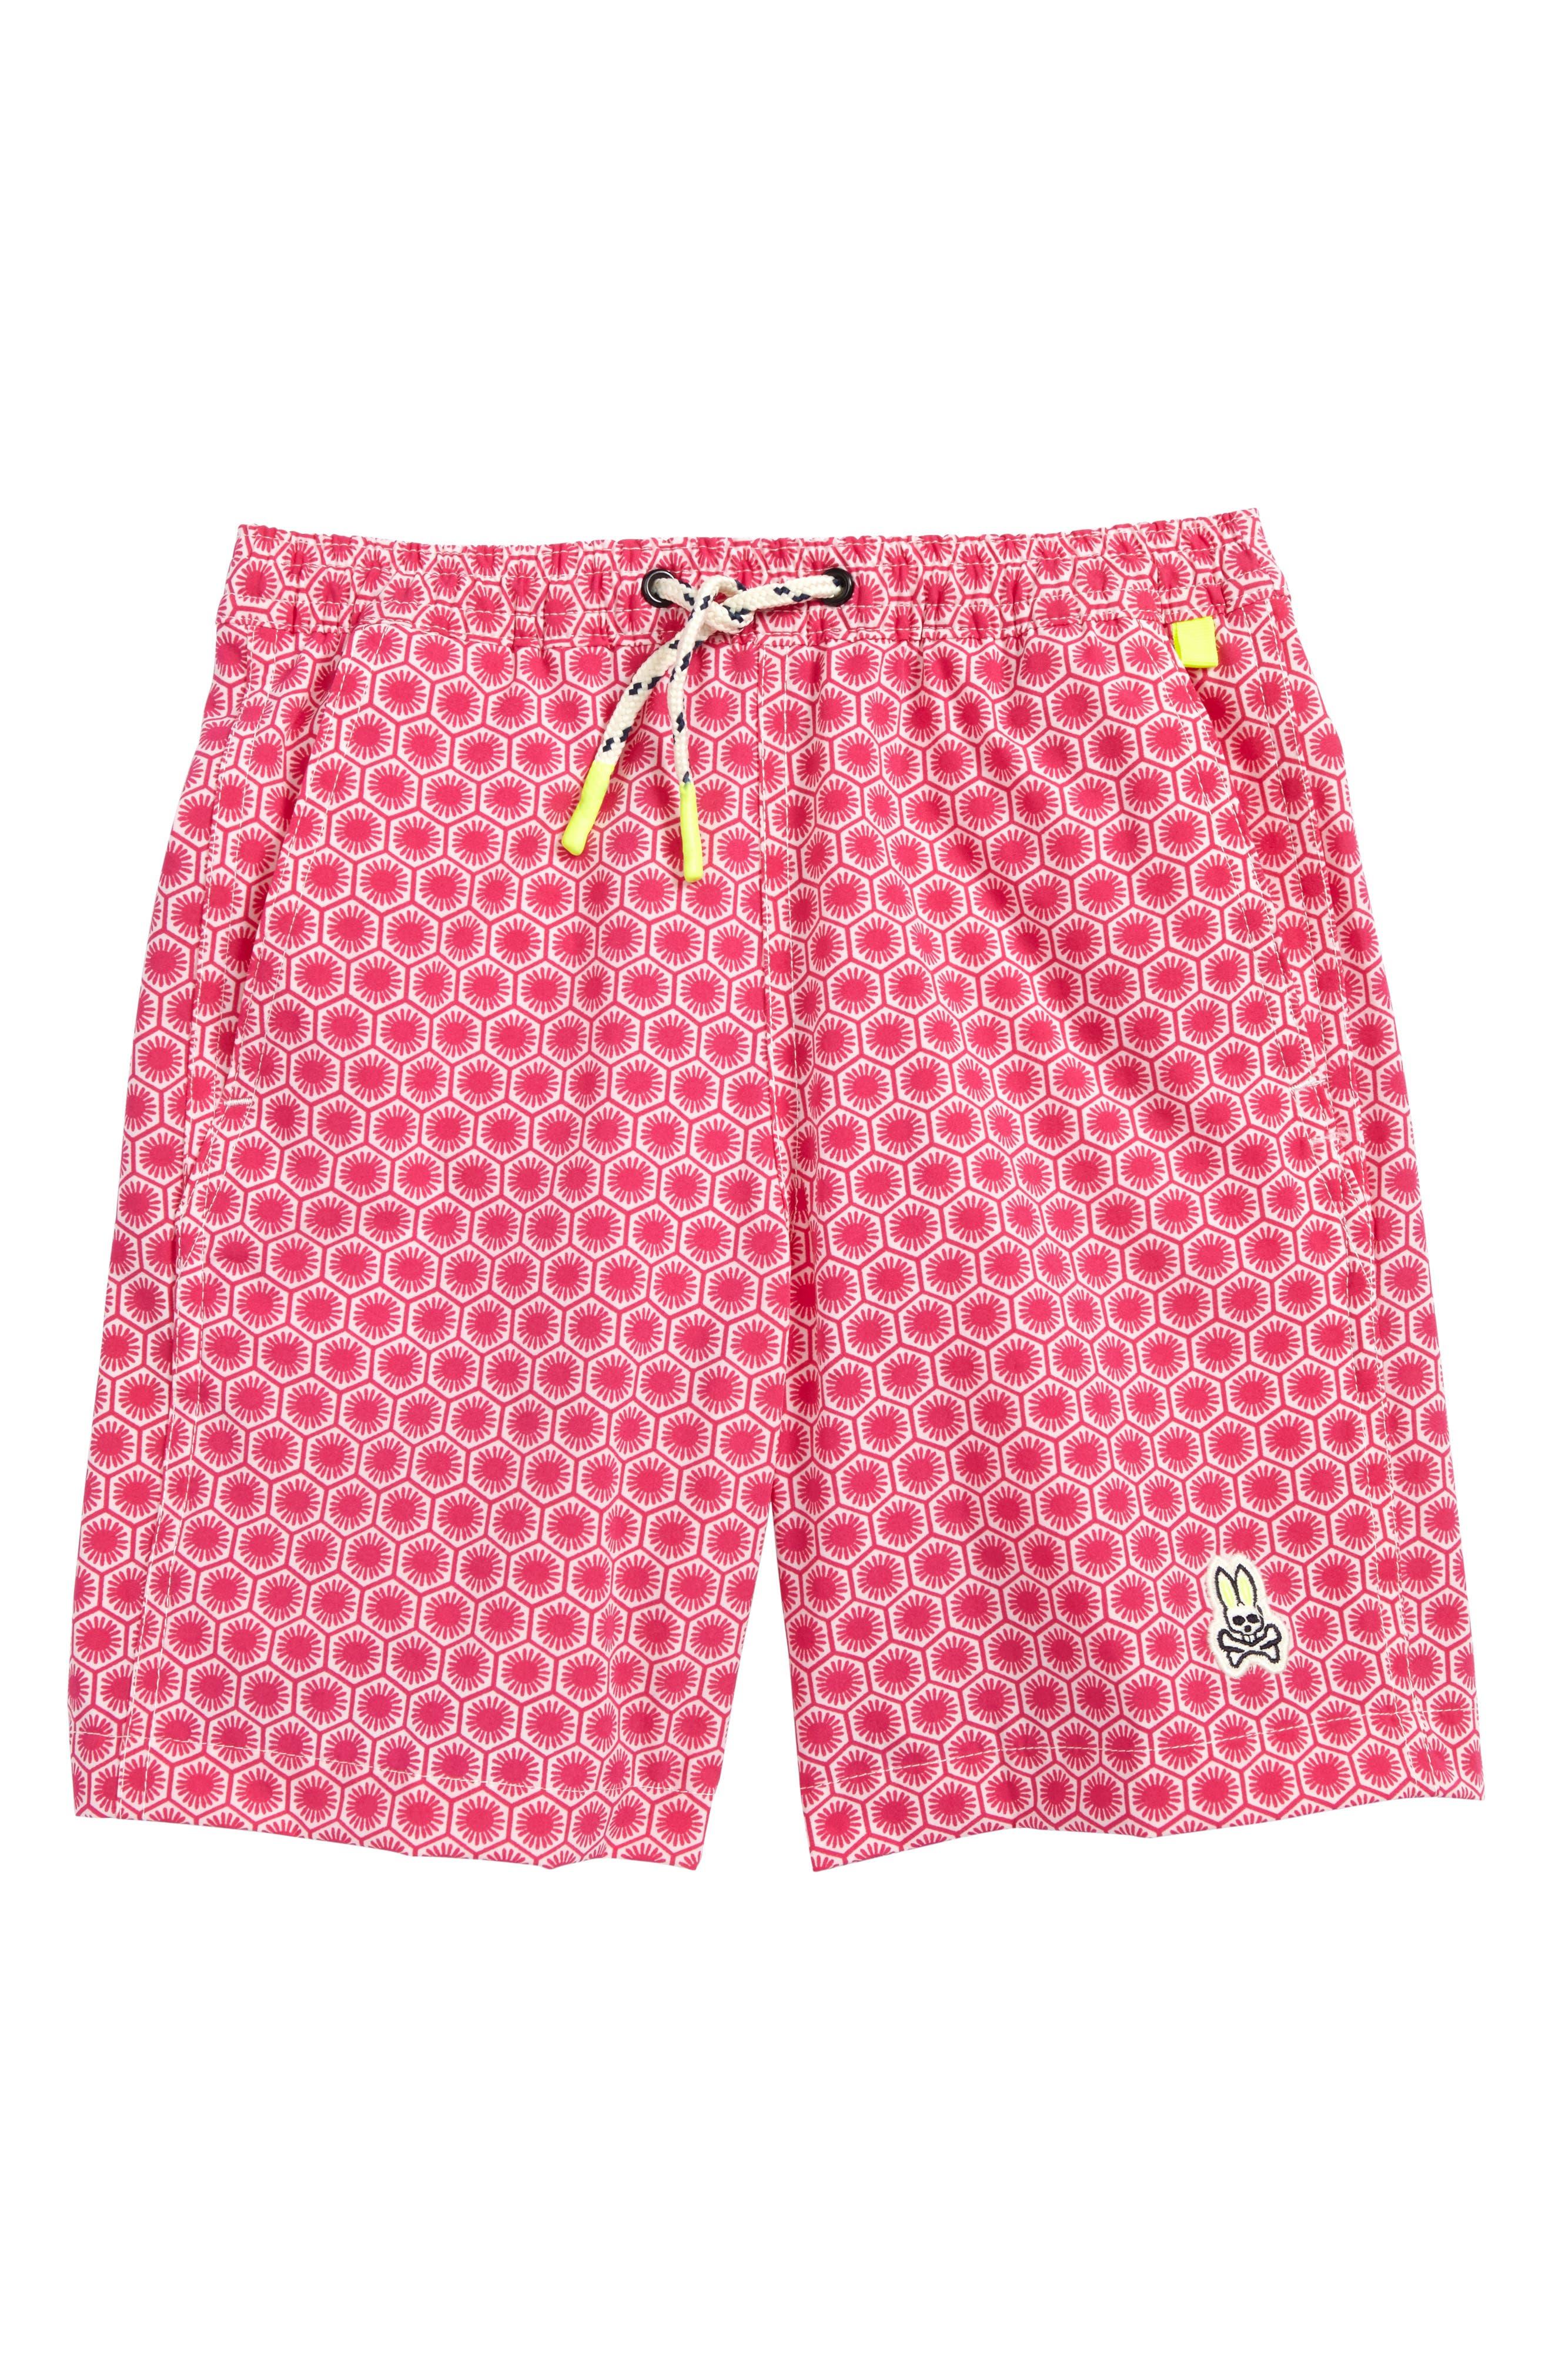 Main Image - Psycho Bunny Honeycomb Board Shorts (Little Boys & Big Boys)